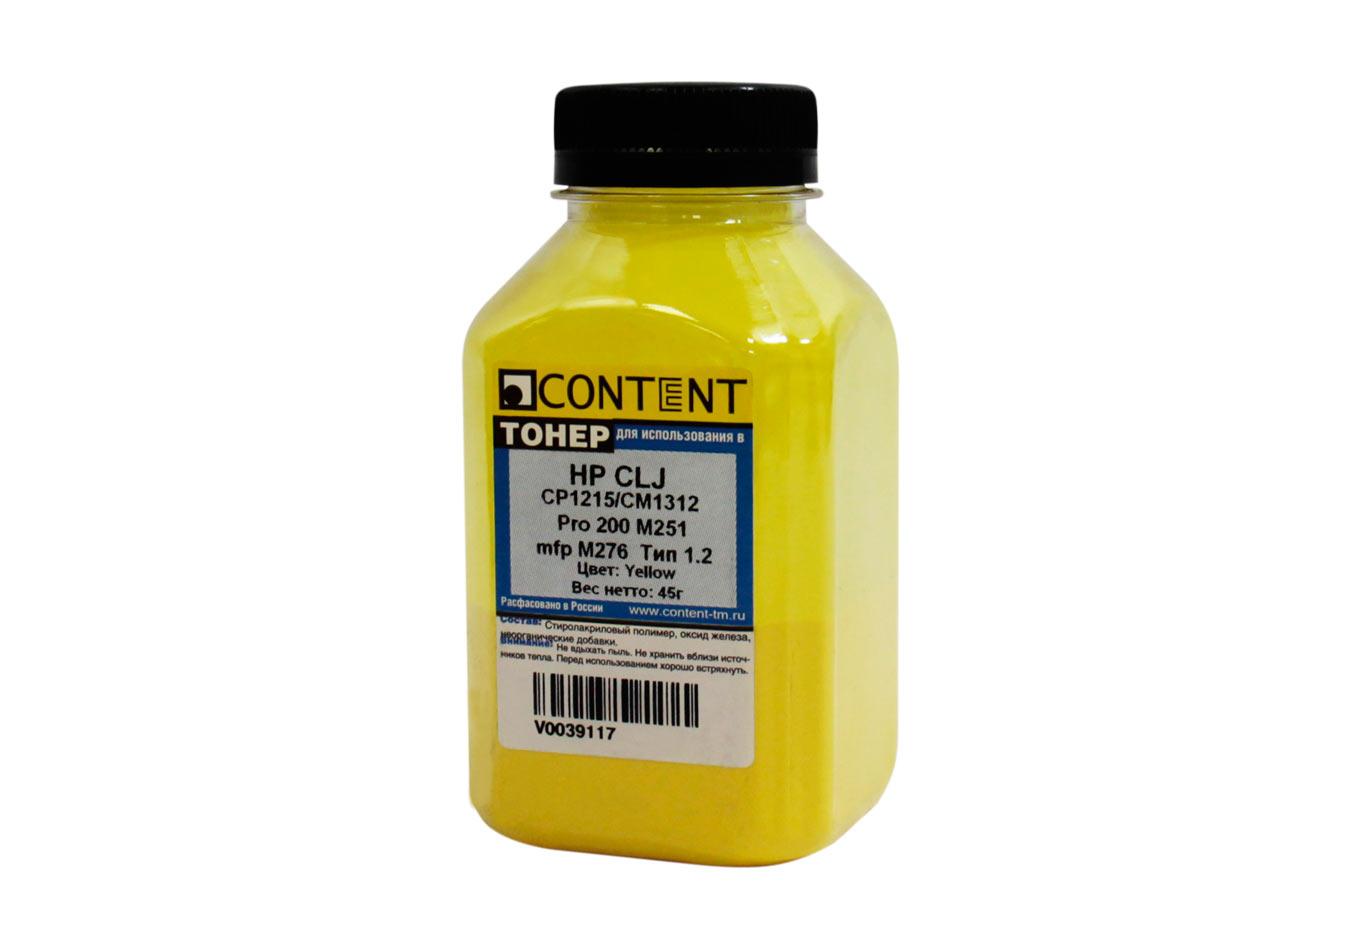 Тонер Content для HP CLJ CP1215/CM1312/Pro 200 M251/mfp M276, Тип 1.2, Y, 45 г, банка